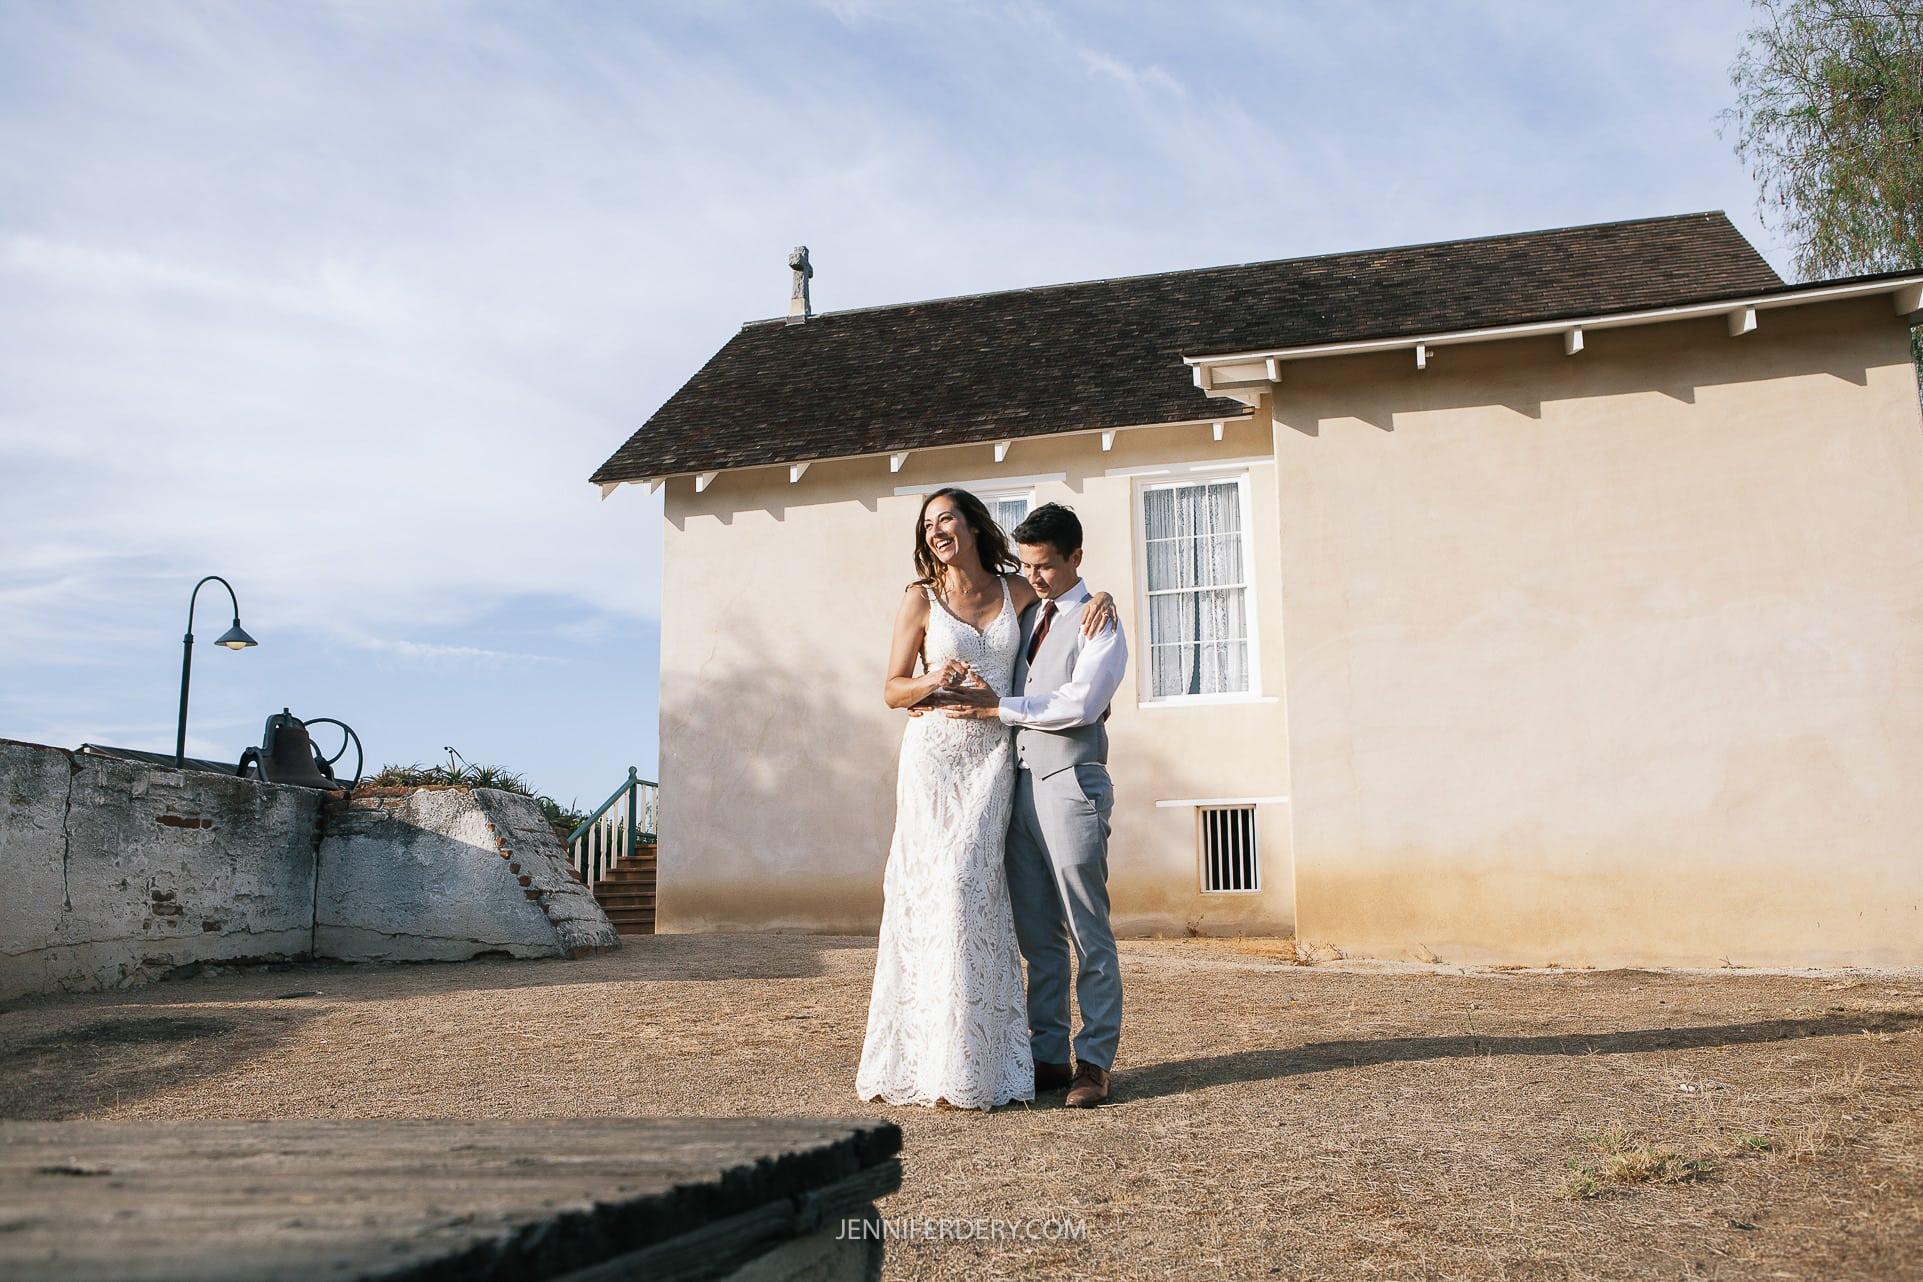 Rancho Guajome Adobe Wedding: Tanya & Donovan